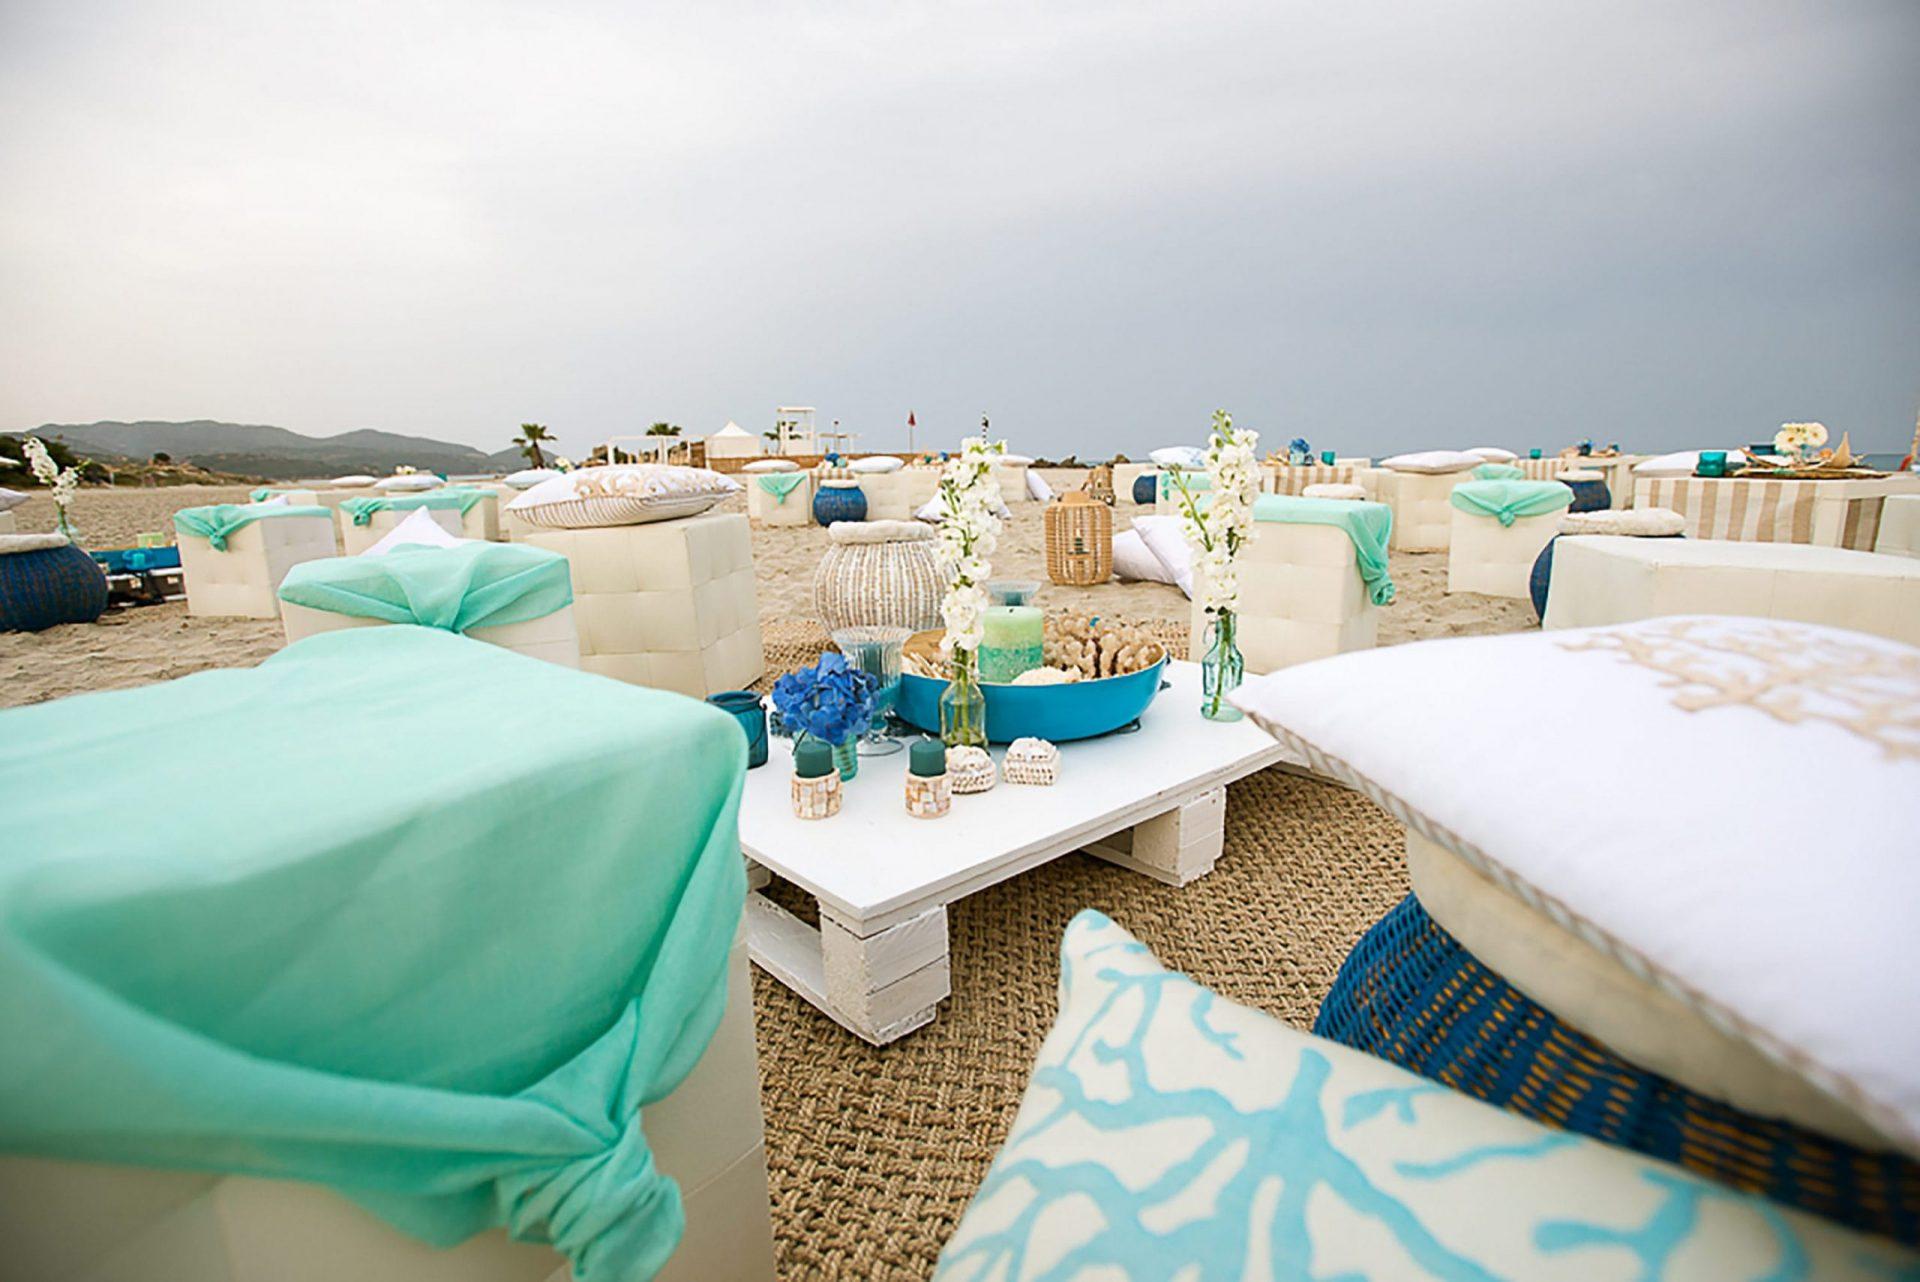 Sardinia. Theme party on the beach, lounge areas